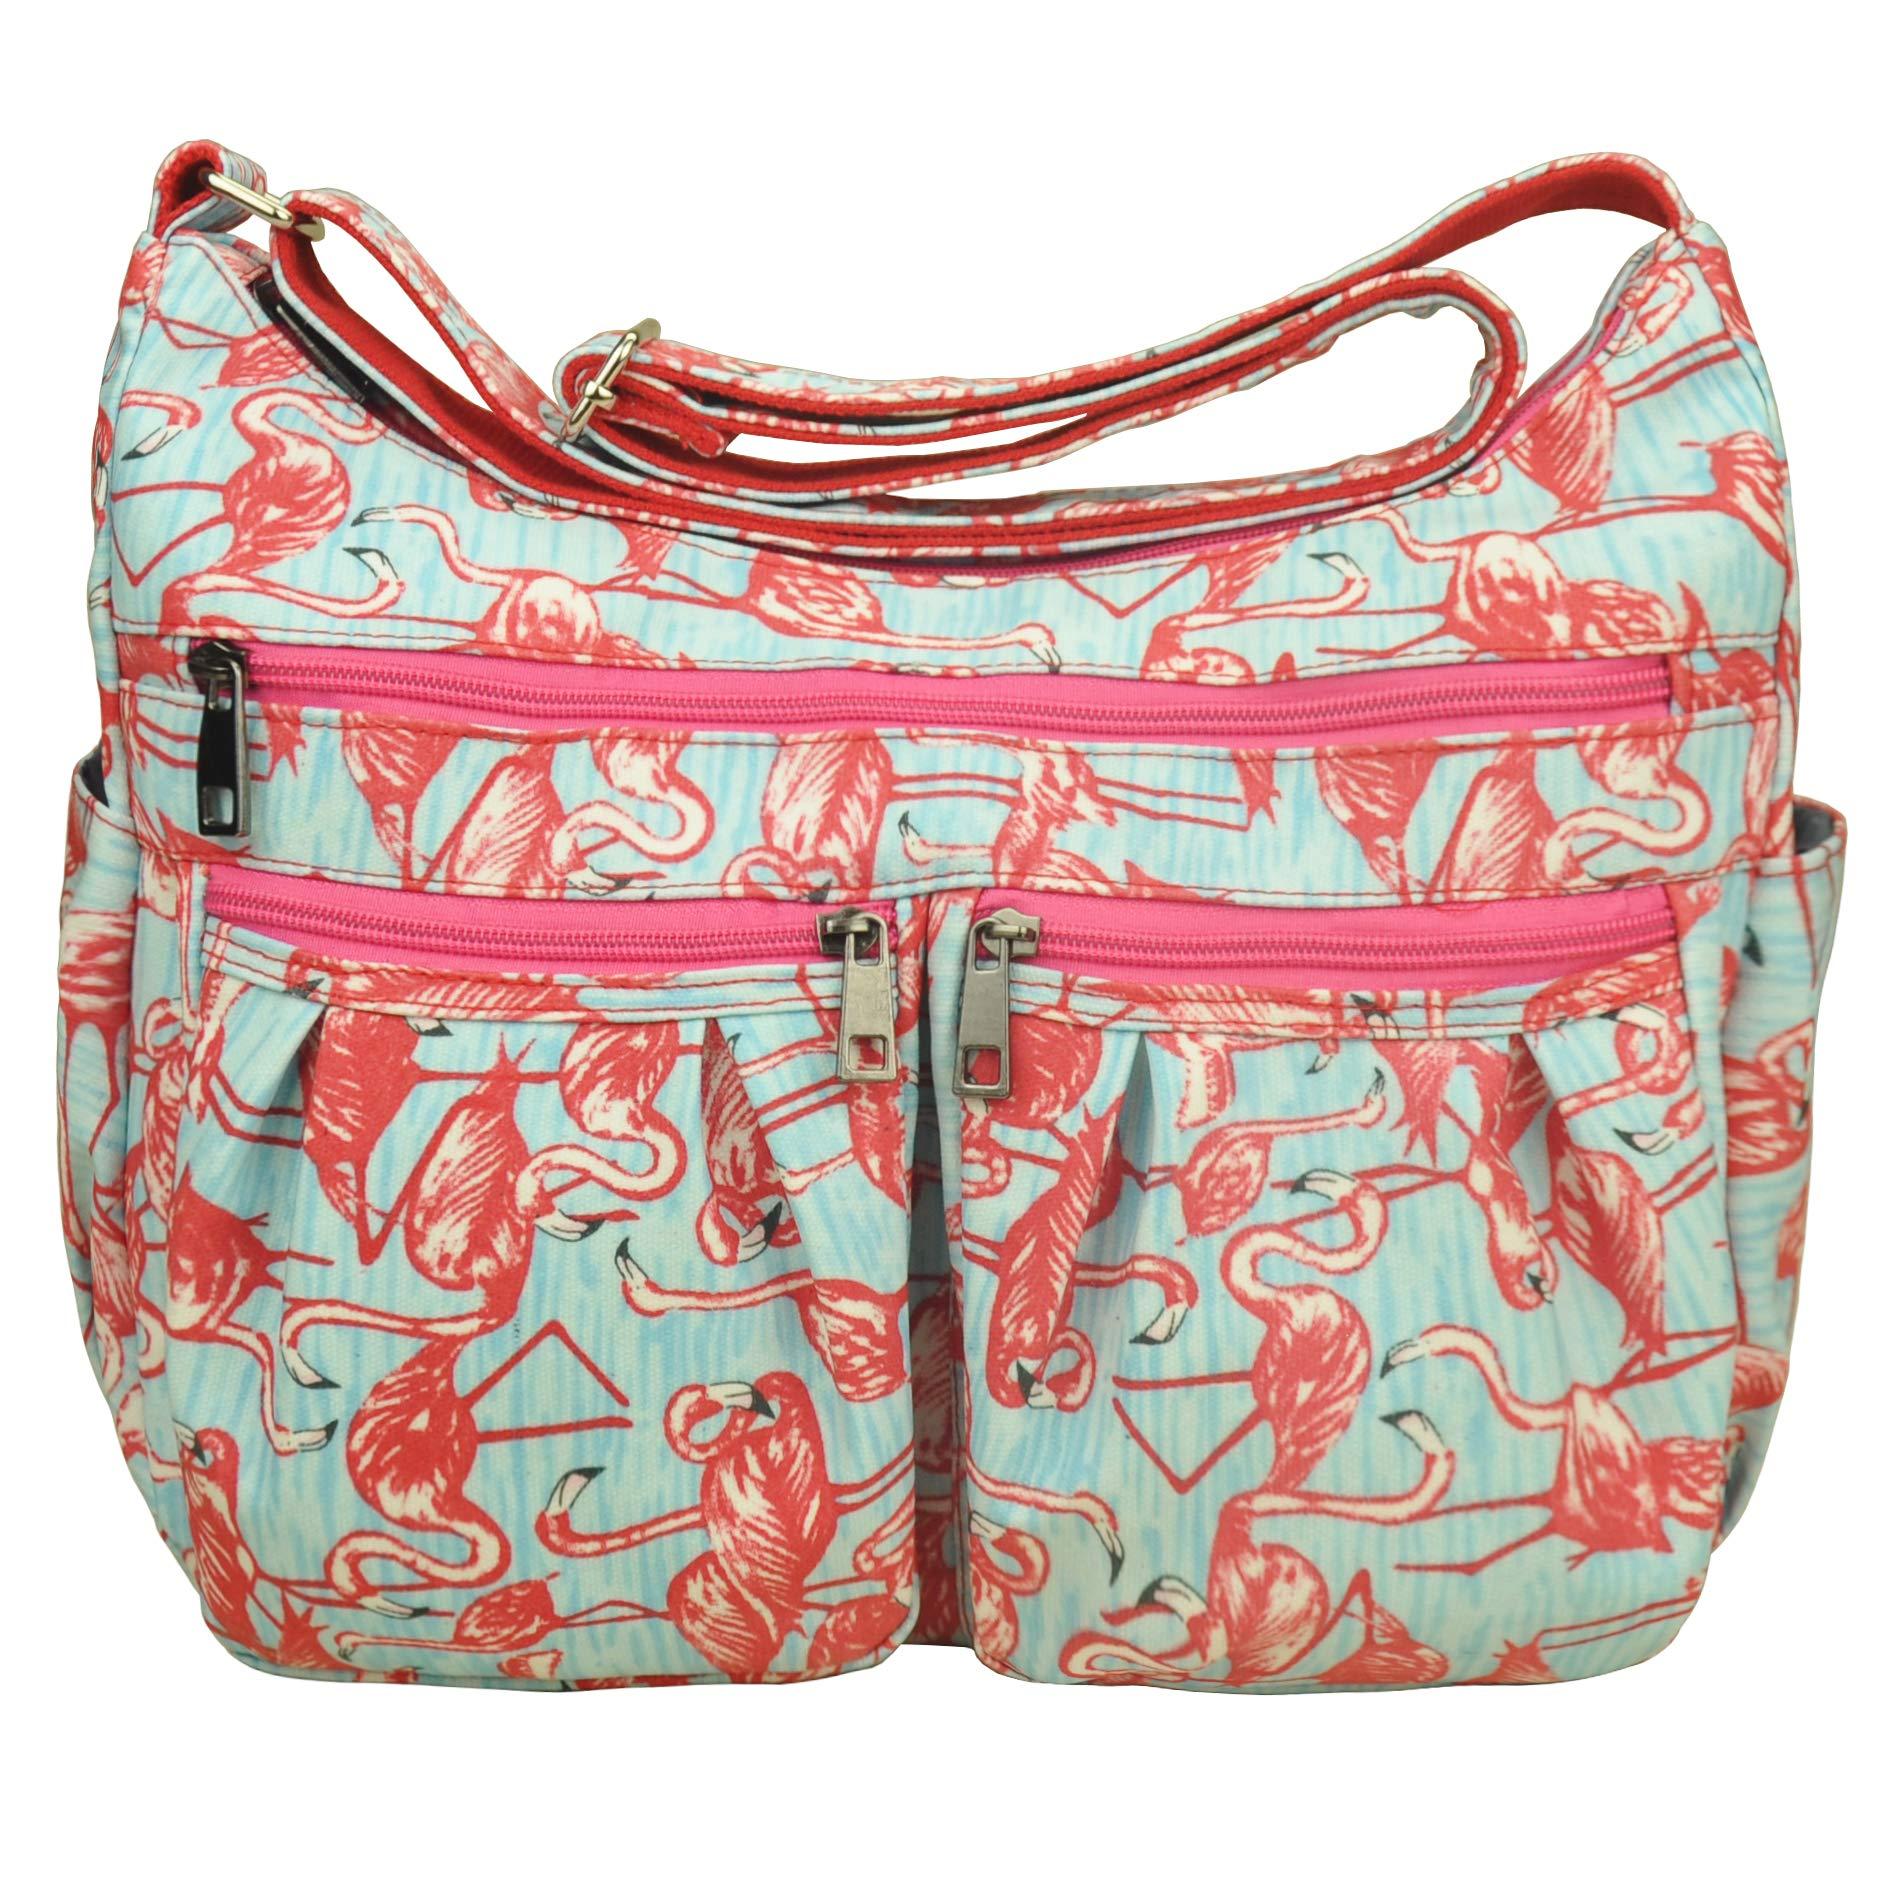 302c850223b4 Galleon - Crossbody Bags For Women